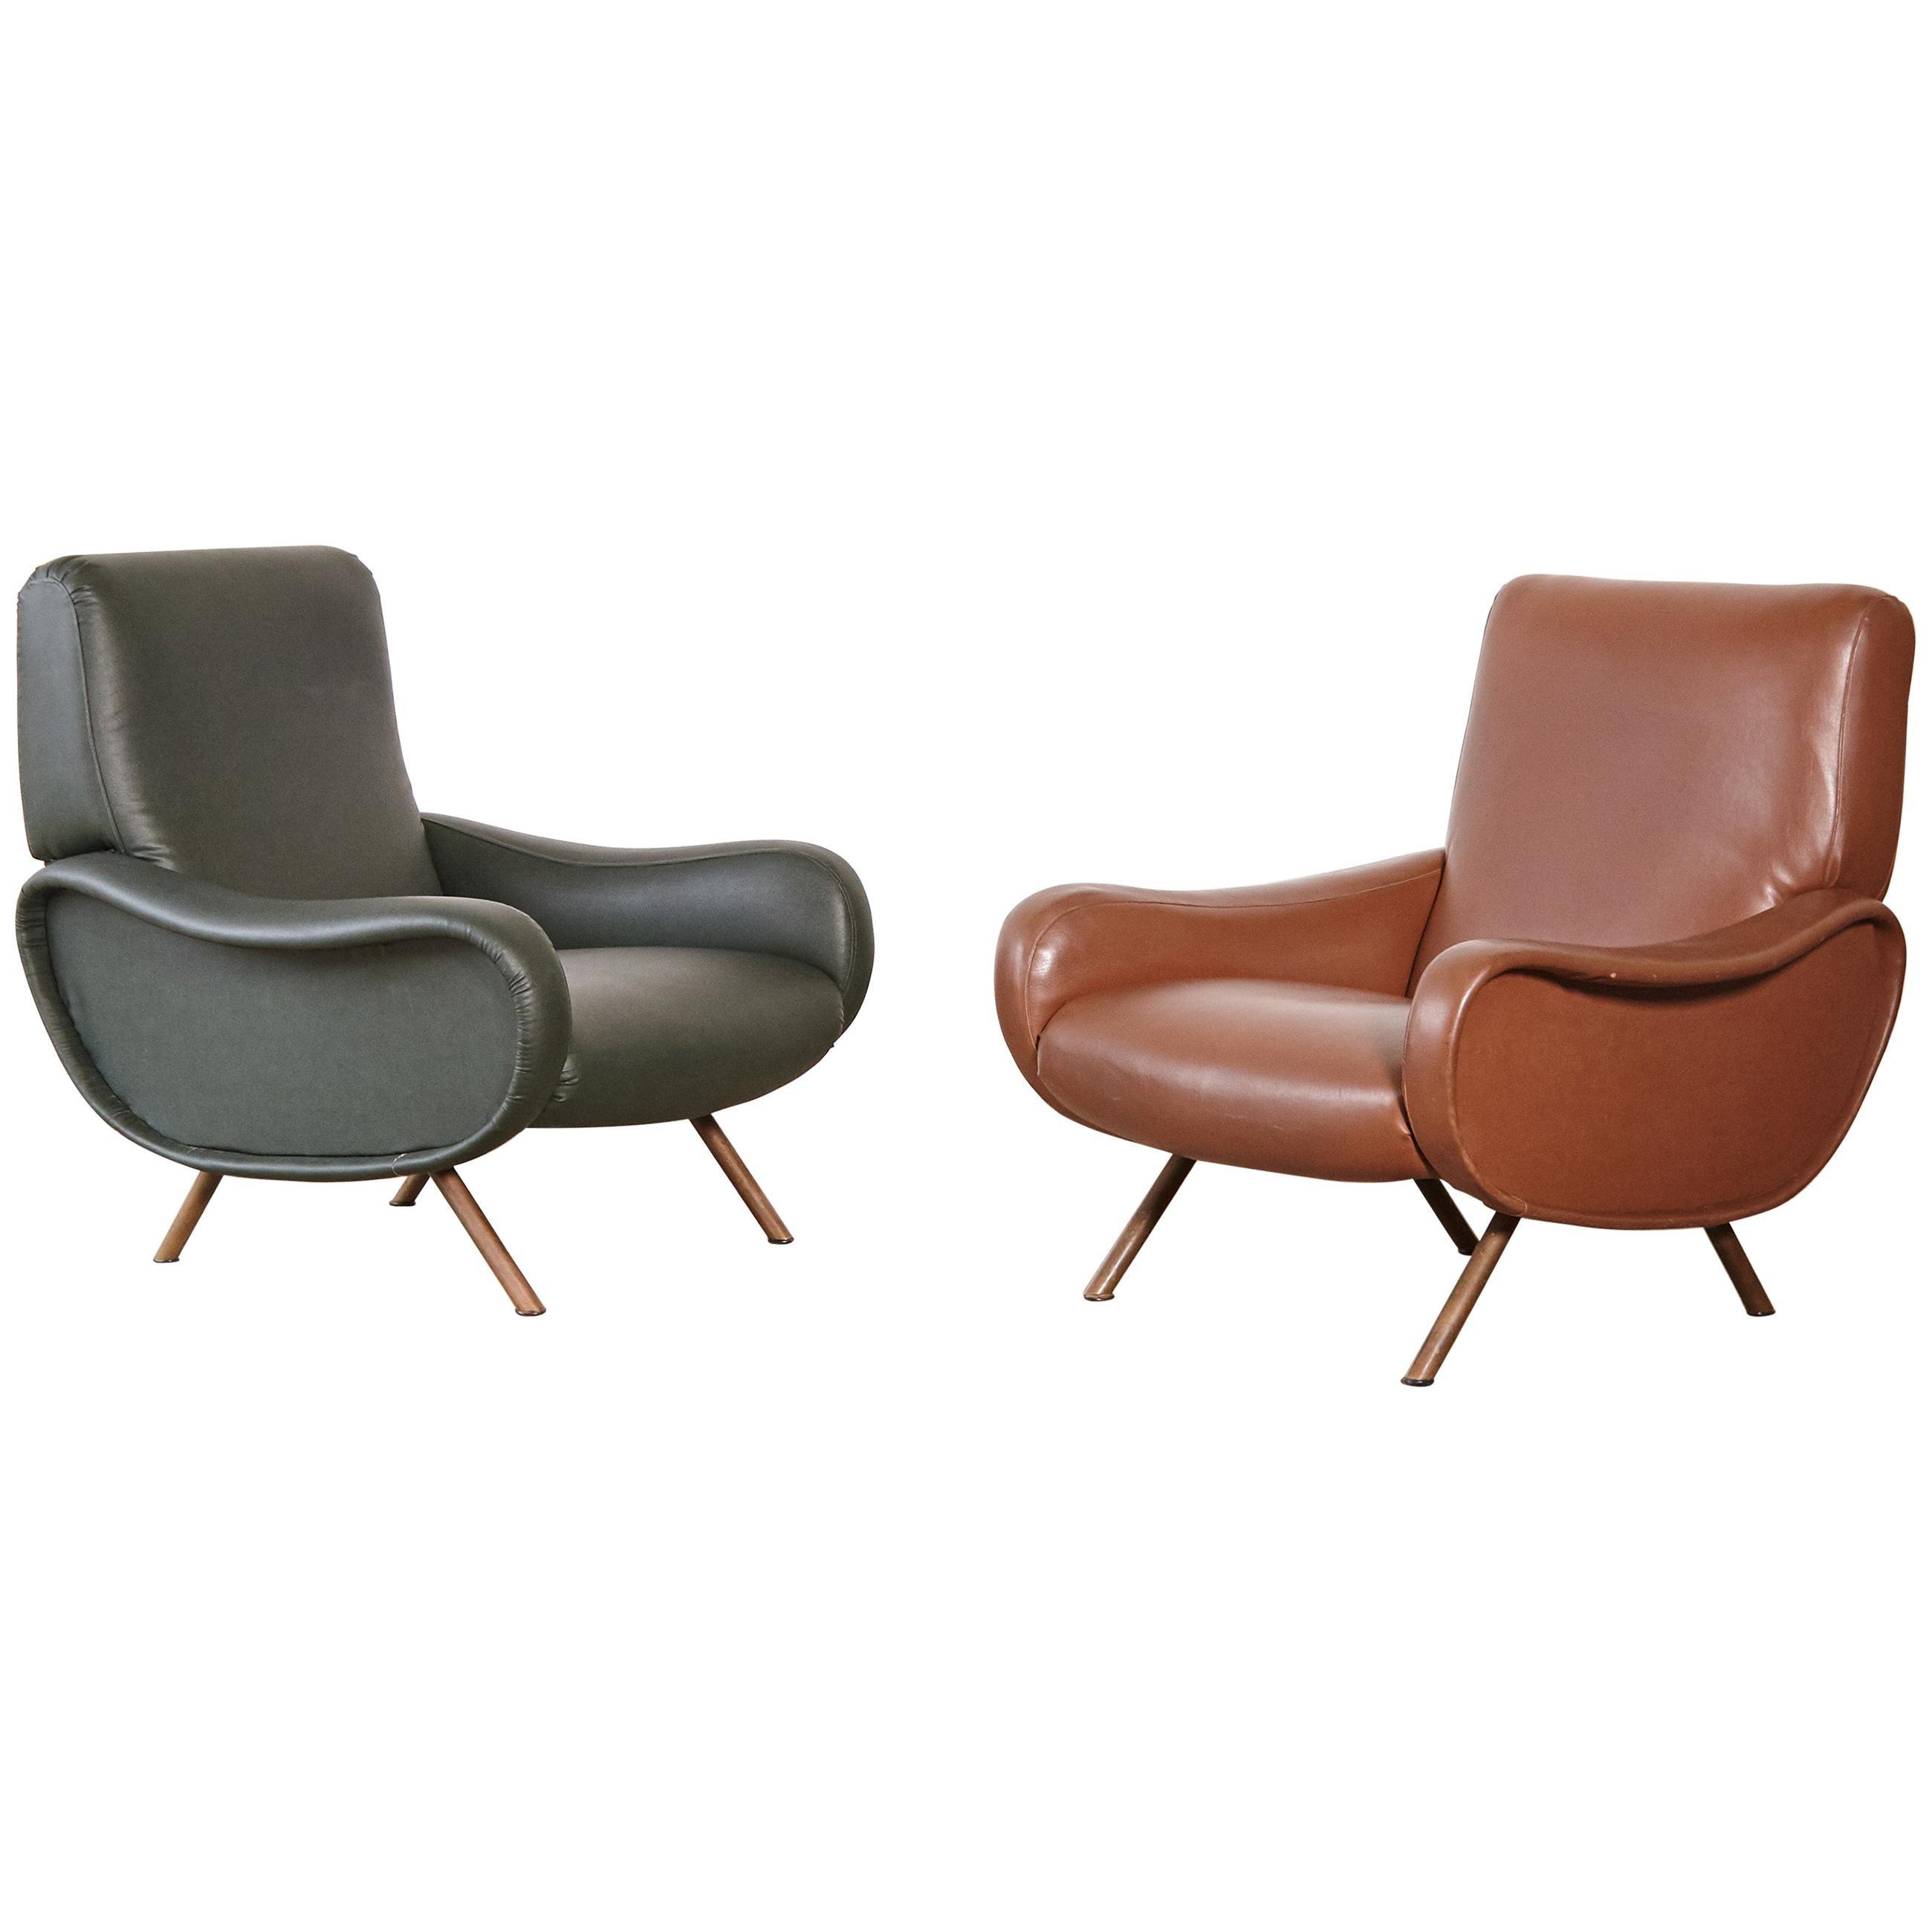 Authentic Marco Zanuso Lady Chairs, Arflex, Italy, 1950s/1960s